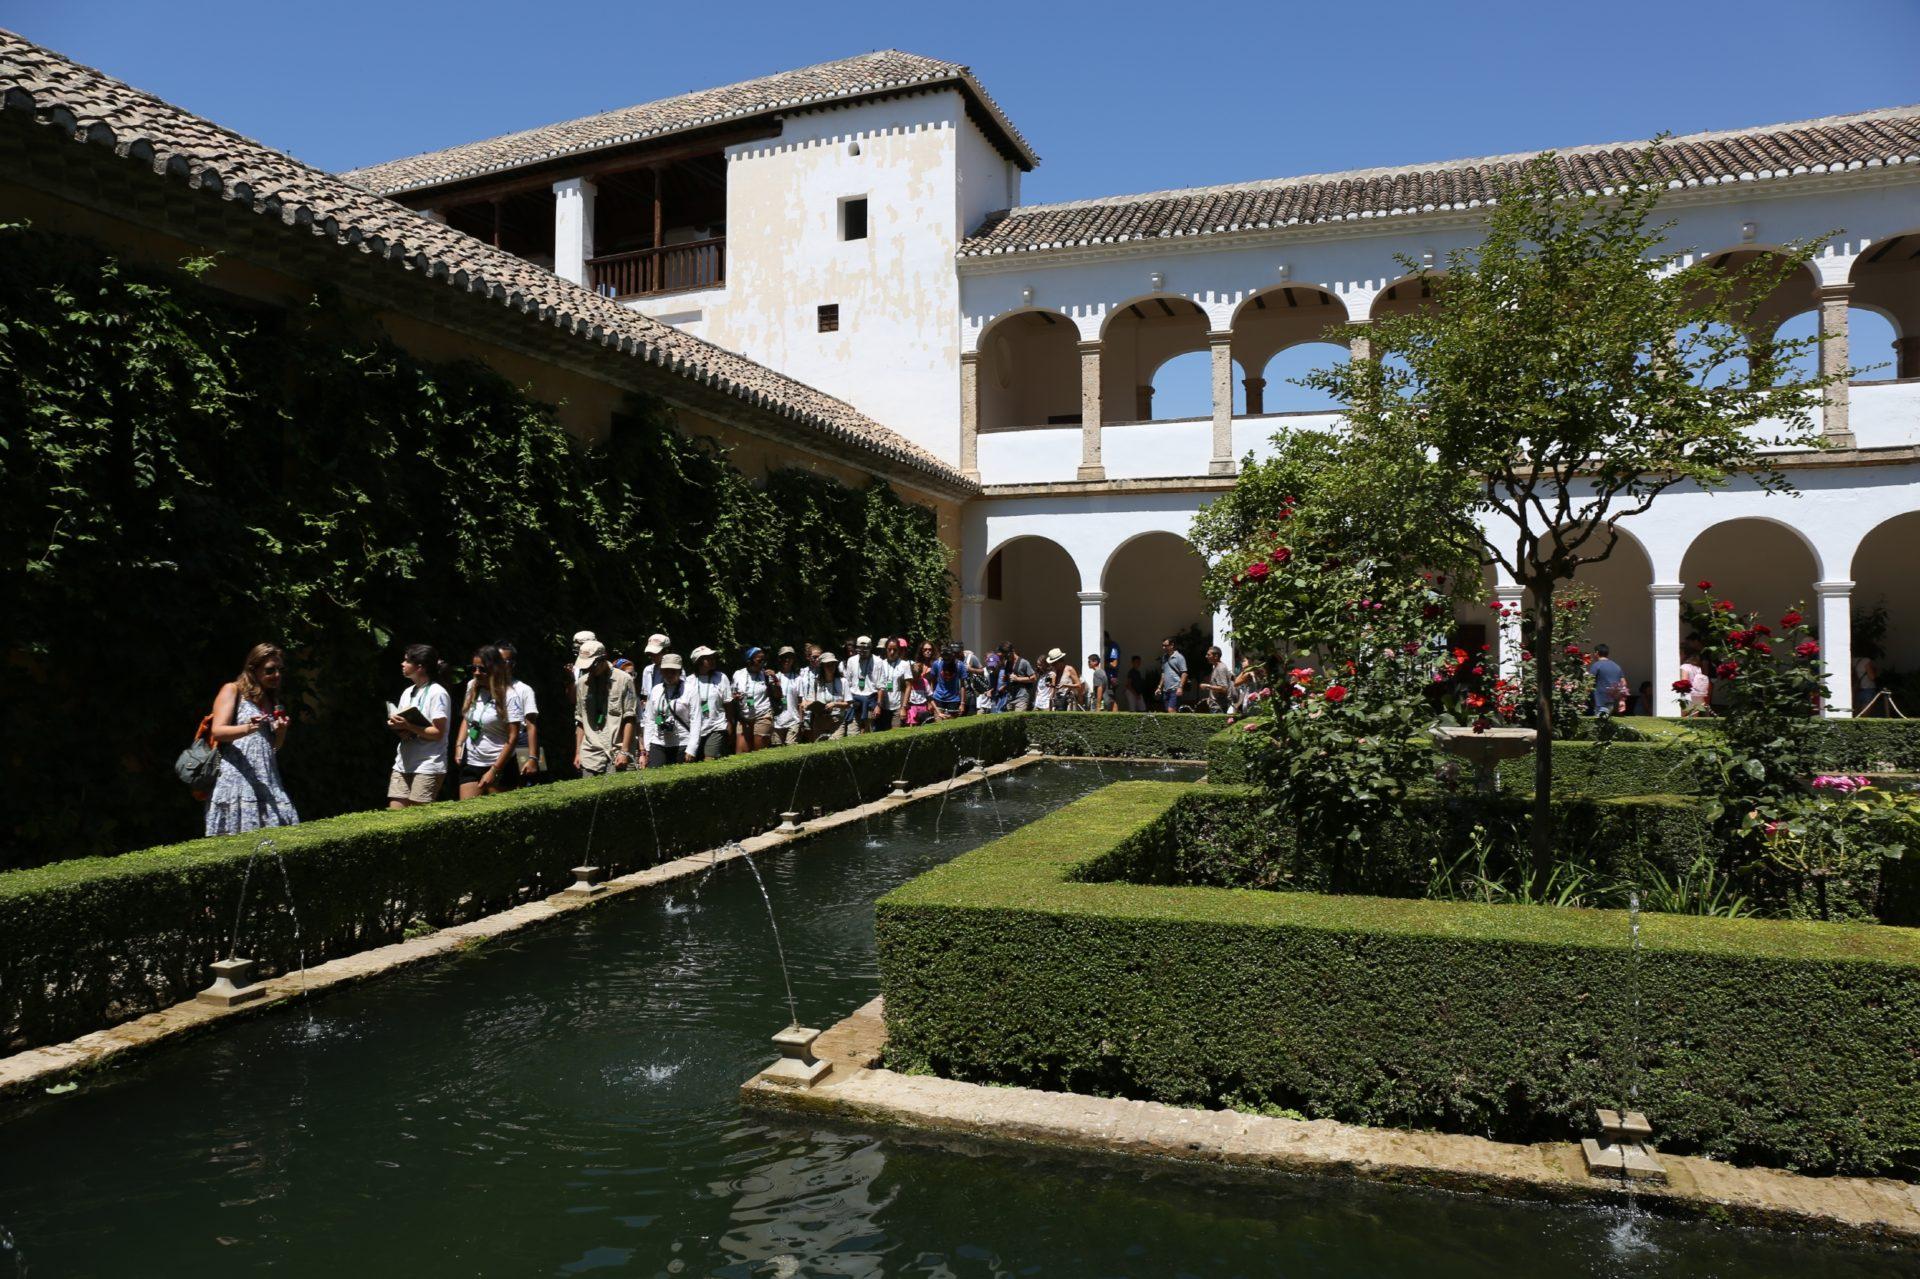 Ruta BBVA en los jardines del Generalife de la Alhambra , Granada 1